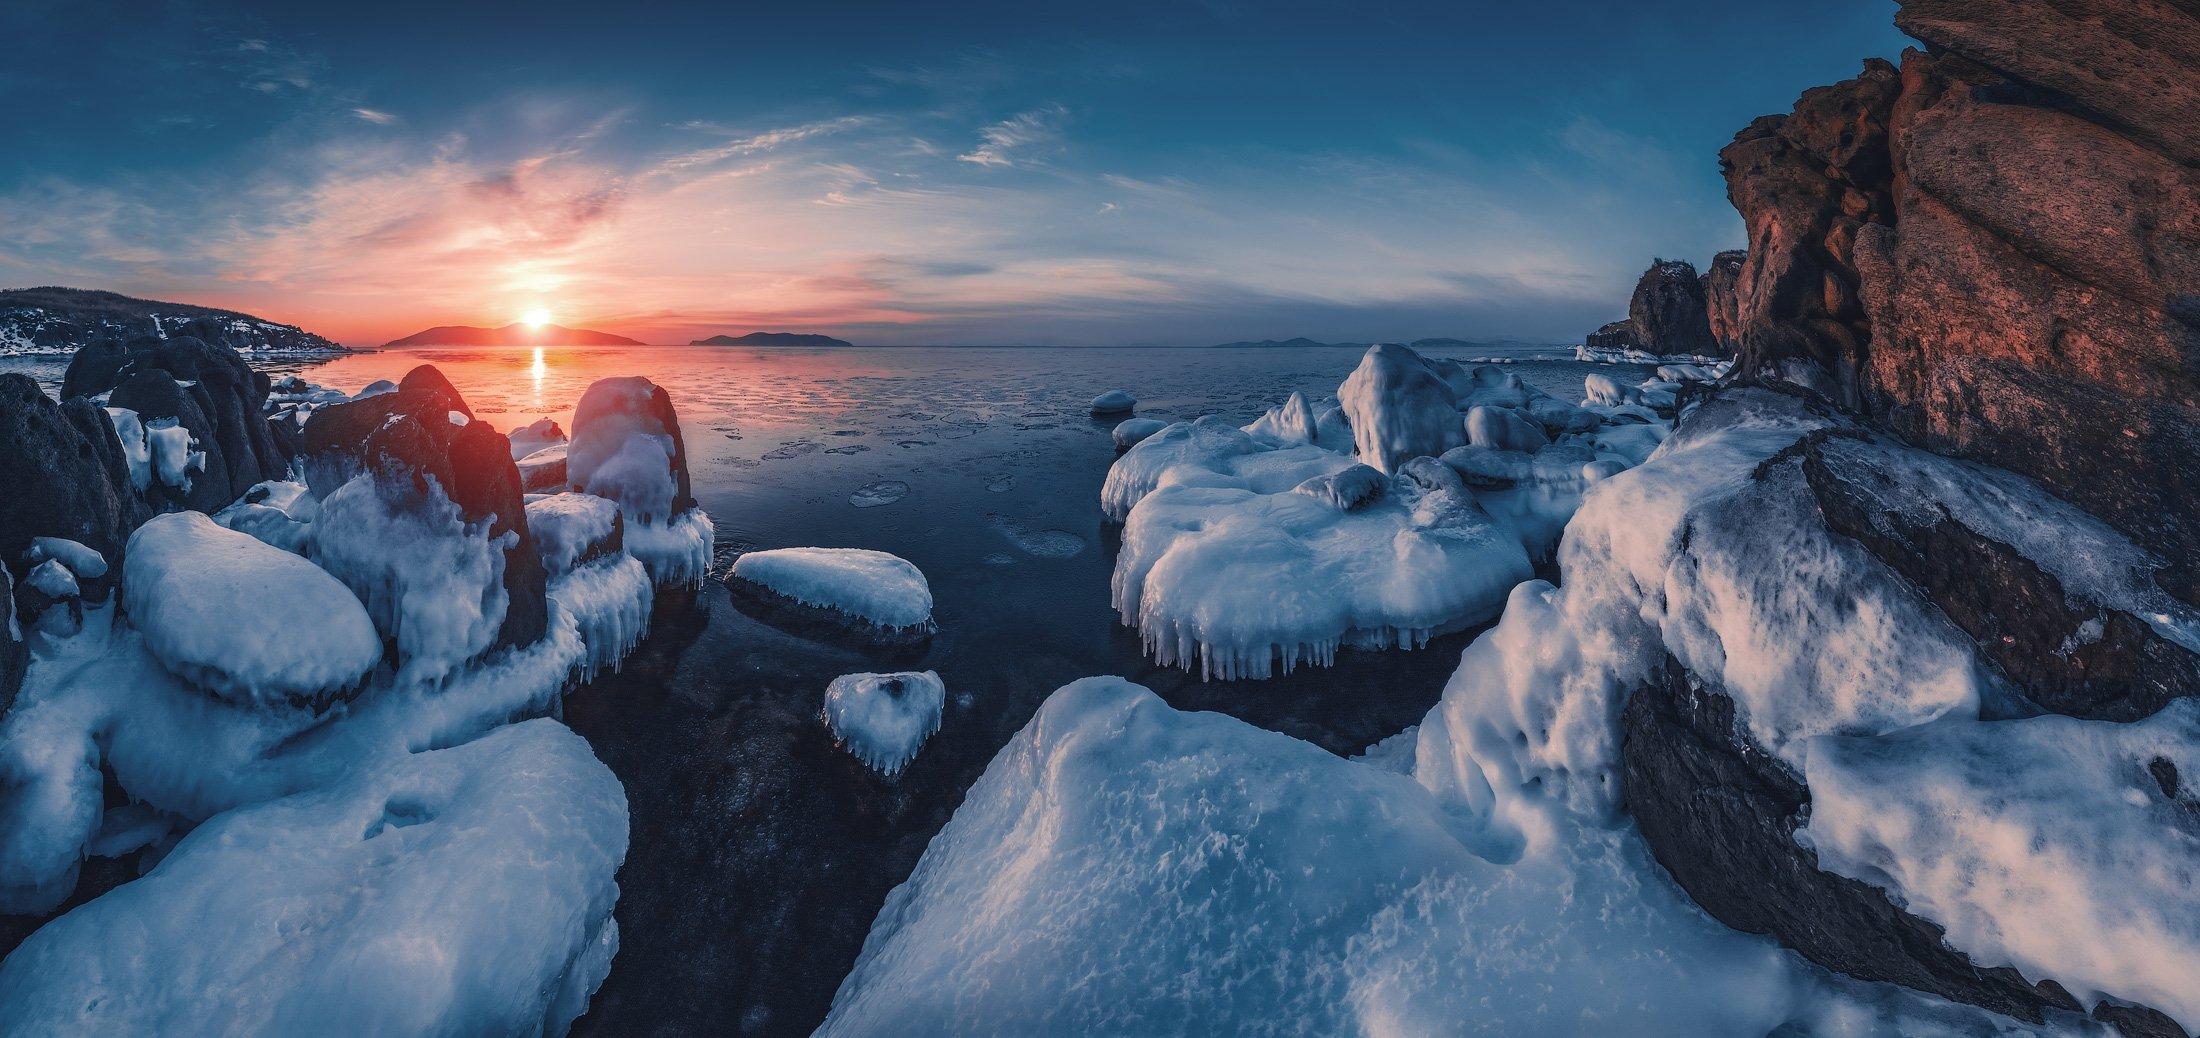 панорама, утро, зима, море, скалы, Андрей Кровлин